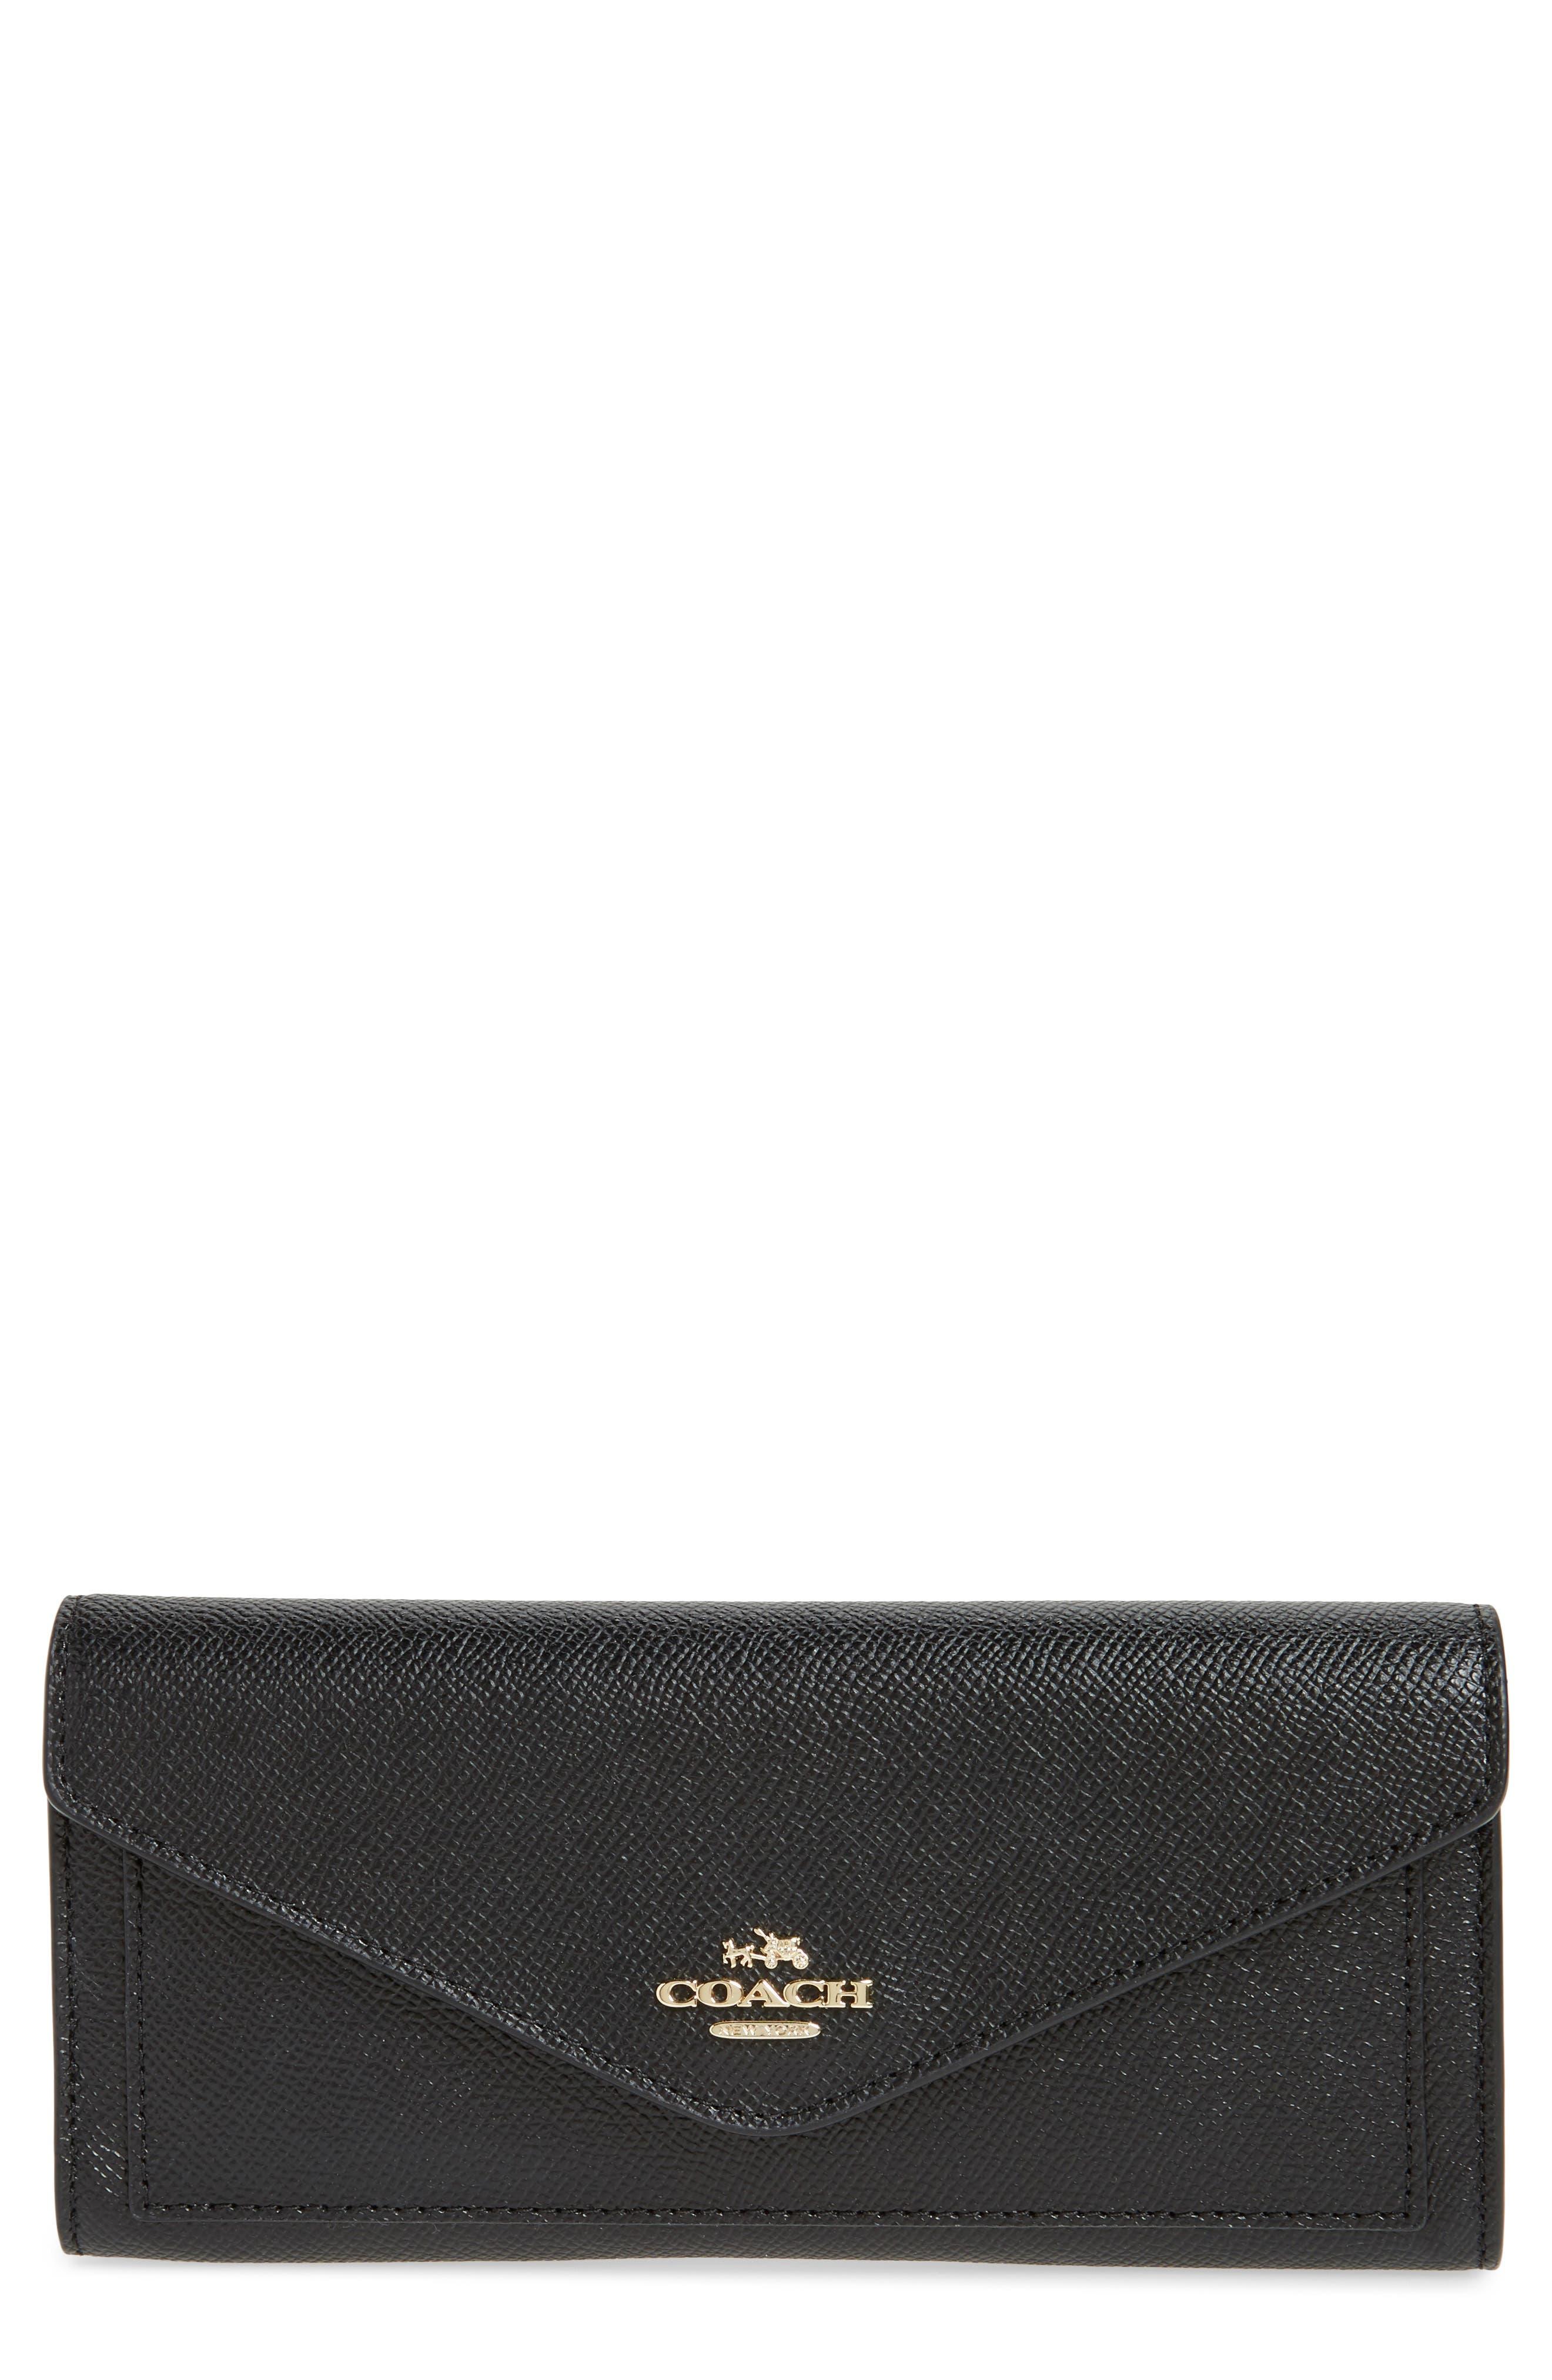 COACH Soft Calfskin Leather Envelope Wallet